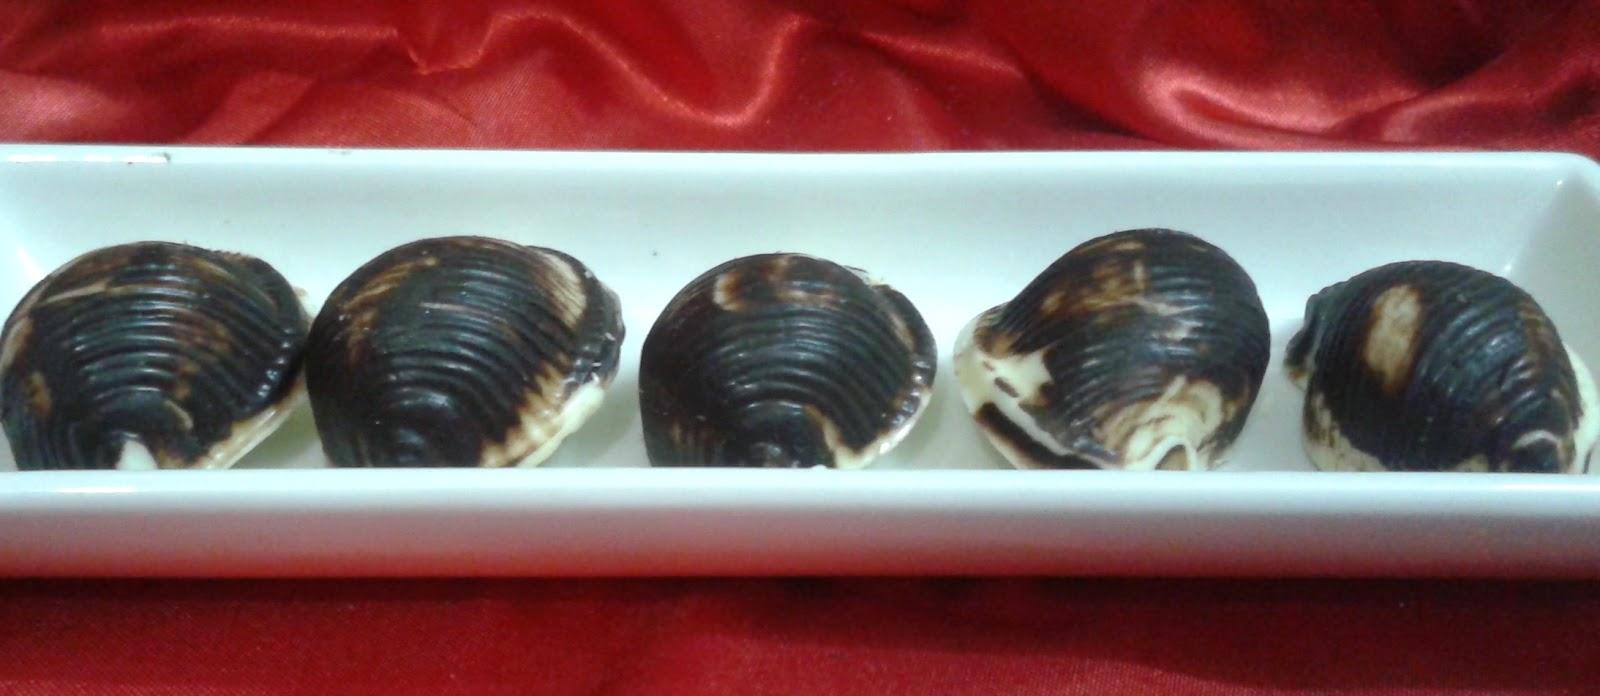 http://www.paakvidhi.com/2014/10/chocolate-shells.html